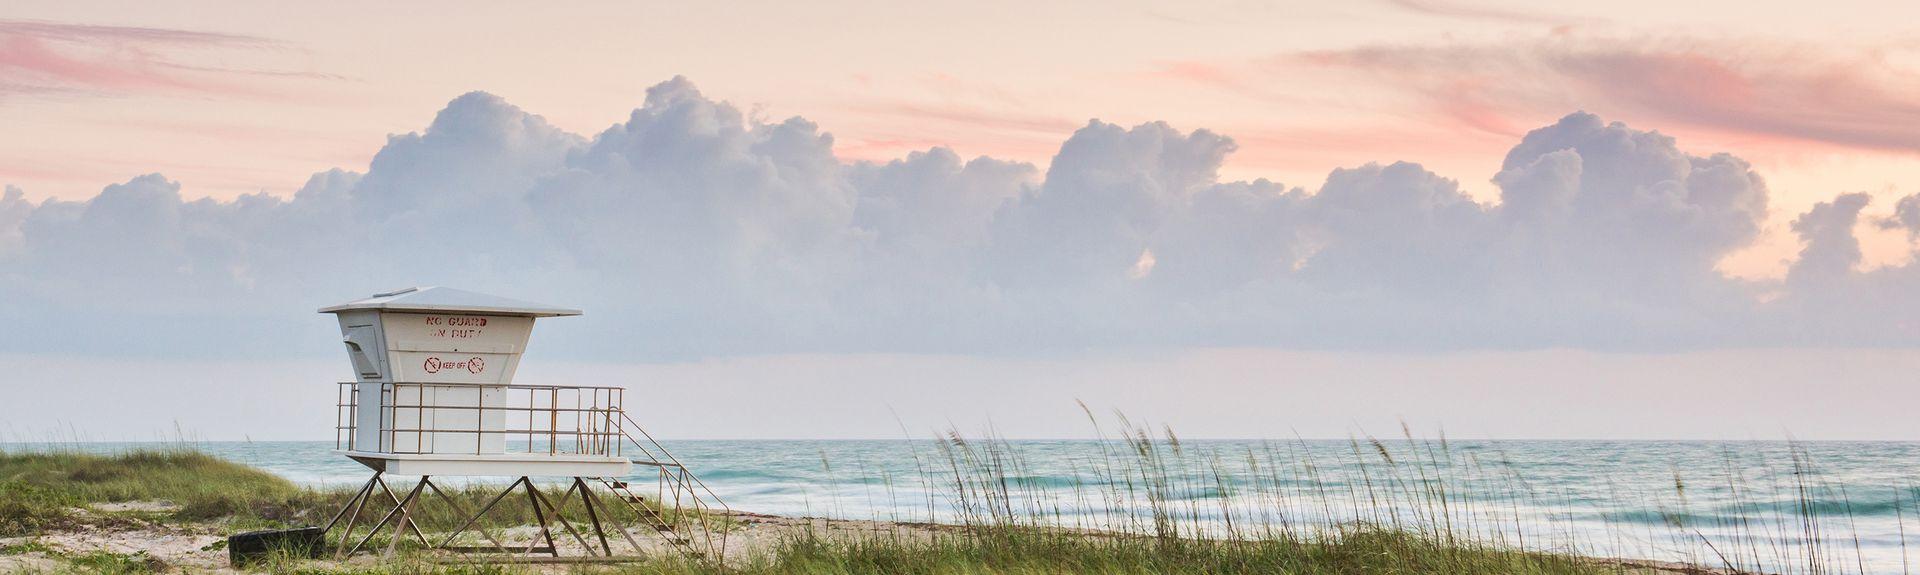 Hutchinson Island, FL, USA